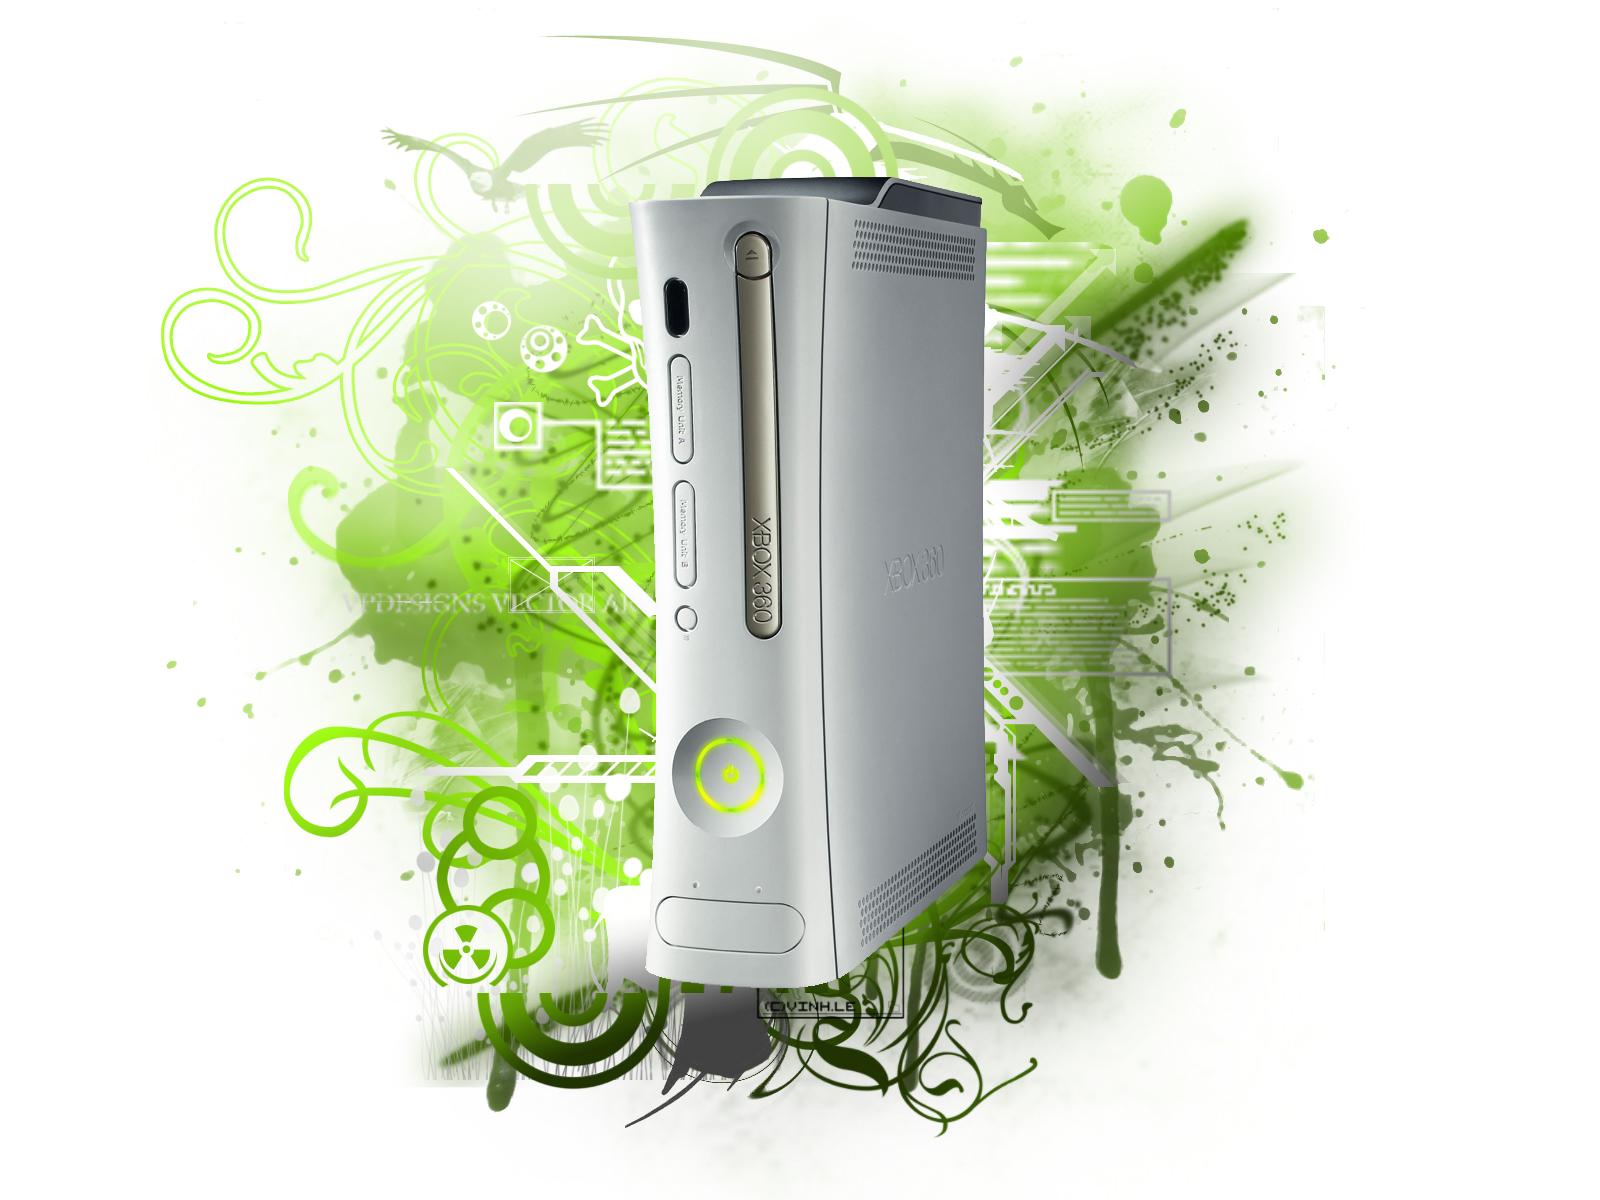 http://1.bp.blogspot.com/_2UbsSBz9ckE/TIMPPL3YnXI/AAAAAAAABWQ/MvoDEIU5jfQ/s1600/xbox-360-hd-wallpaper-green-abstract.jpg